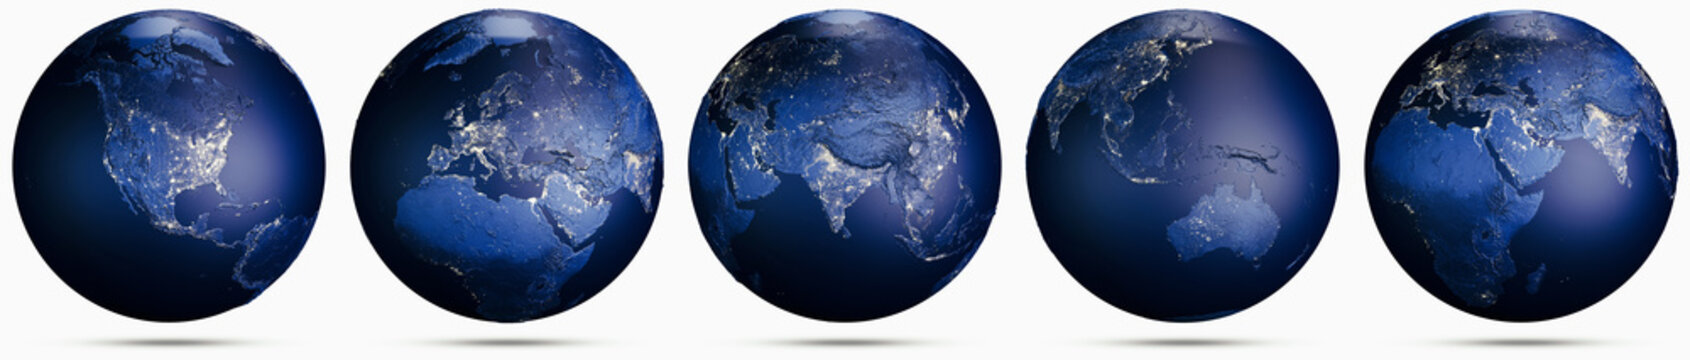 Planet Earth city lights globe set